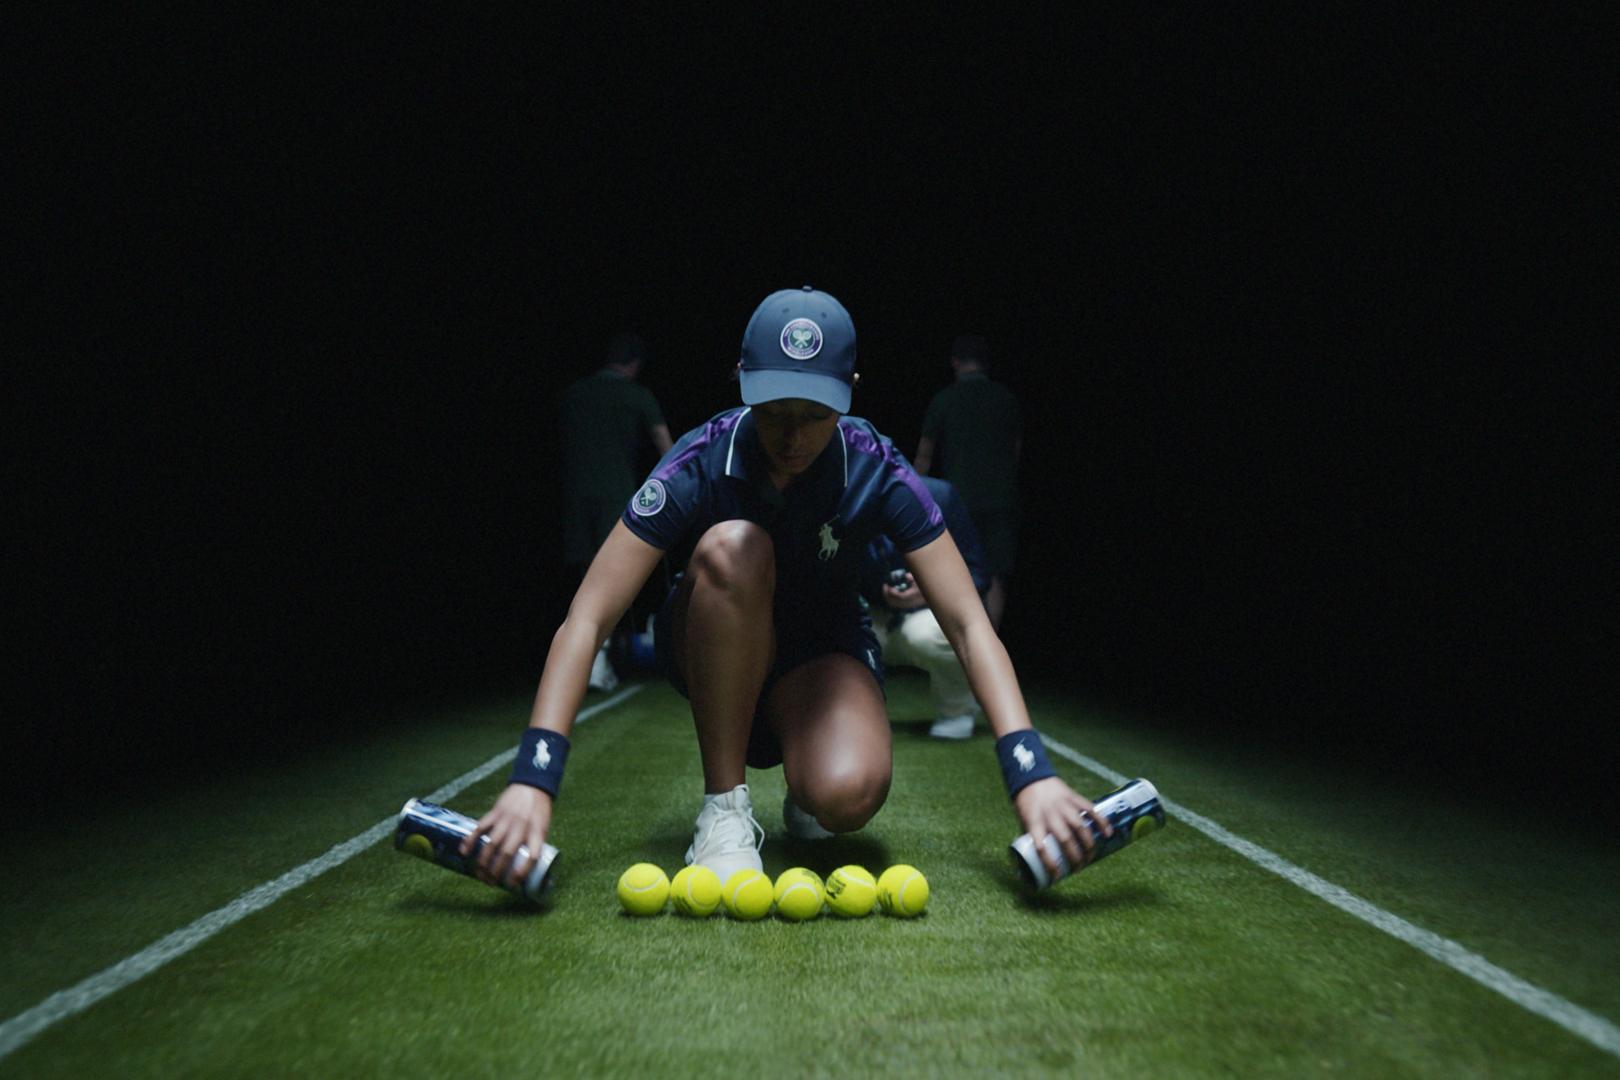 All England Lawn Tennis Club: It's a Wimbledon Thing